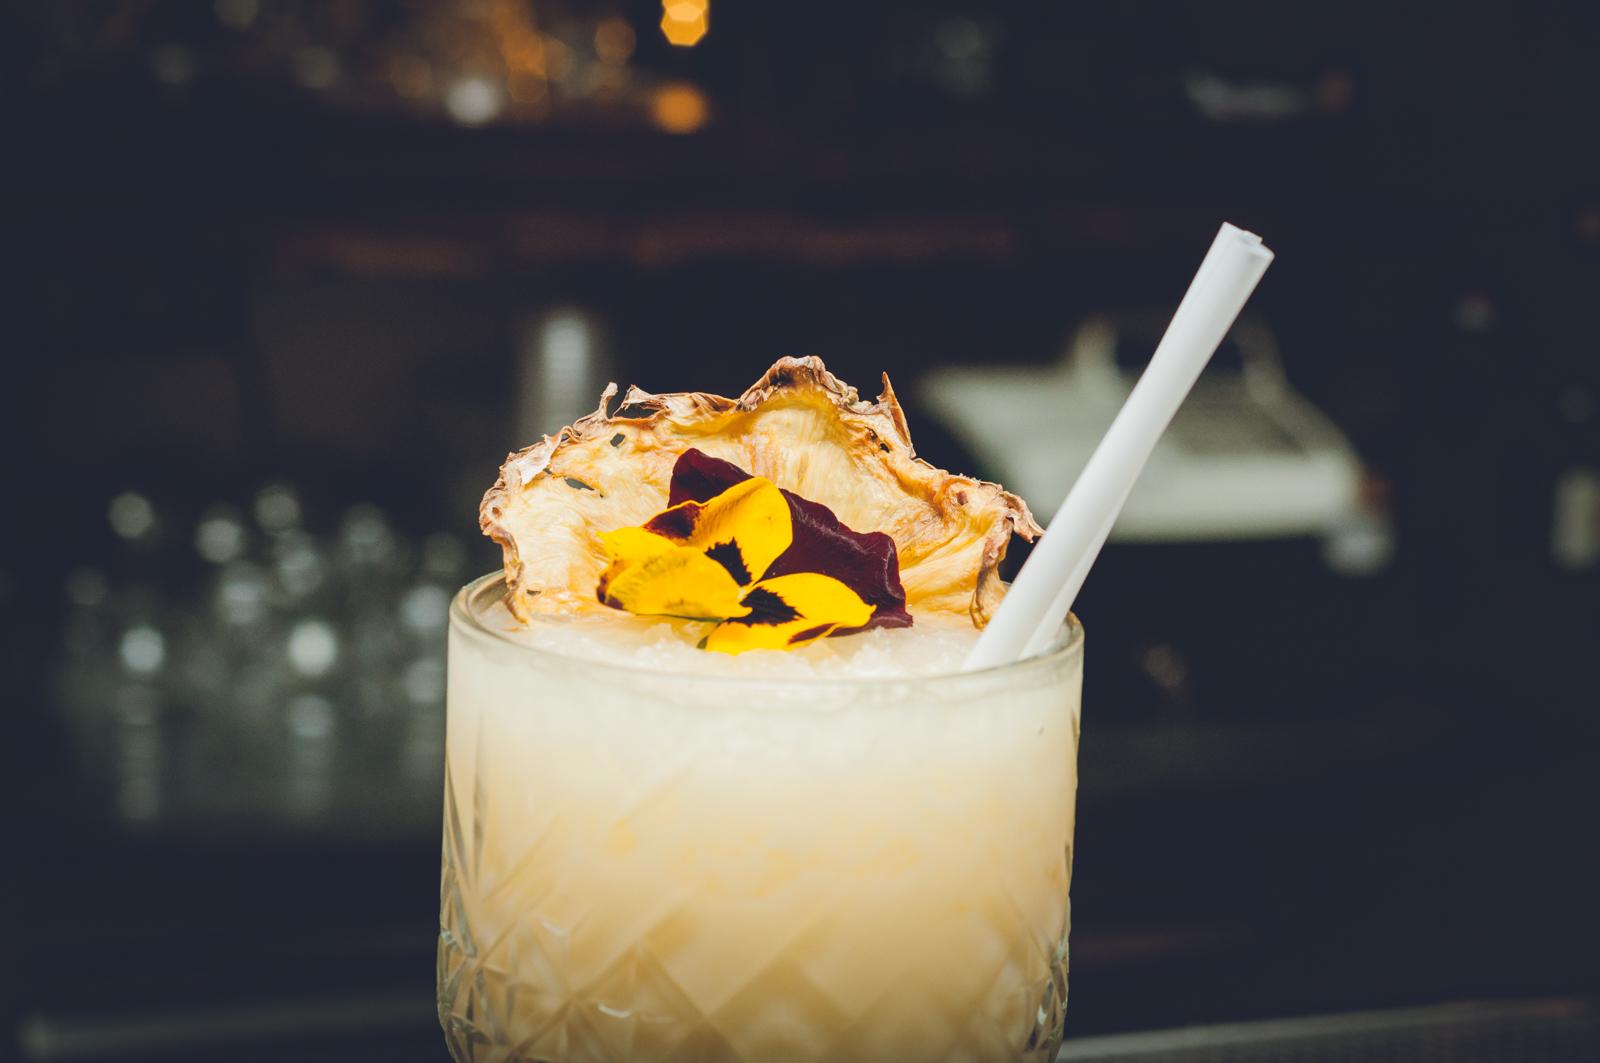 Pina_Colada_caraibi_fabio_camboni_drink_positive_cocktail